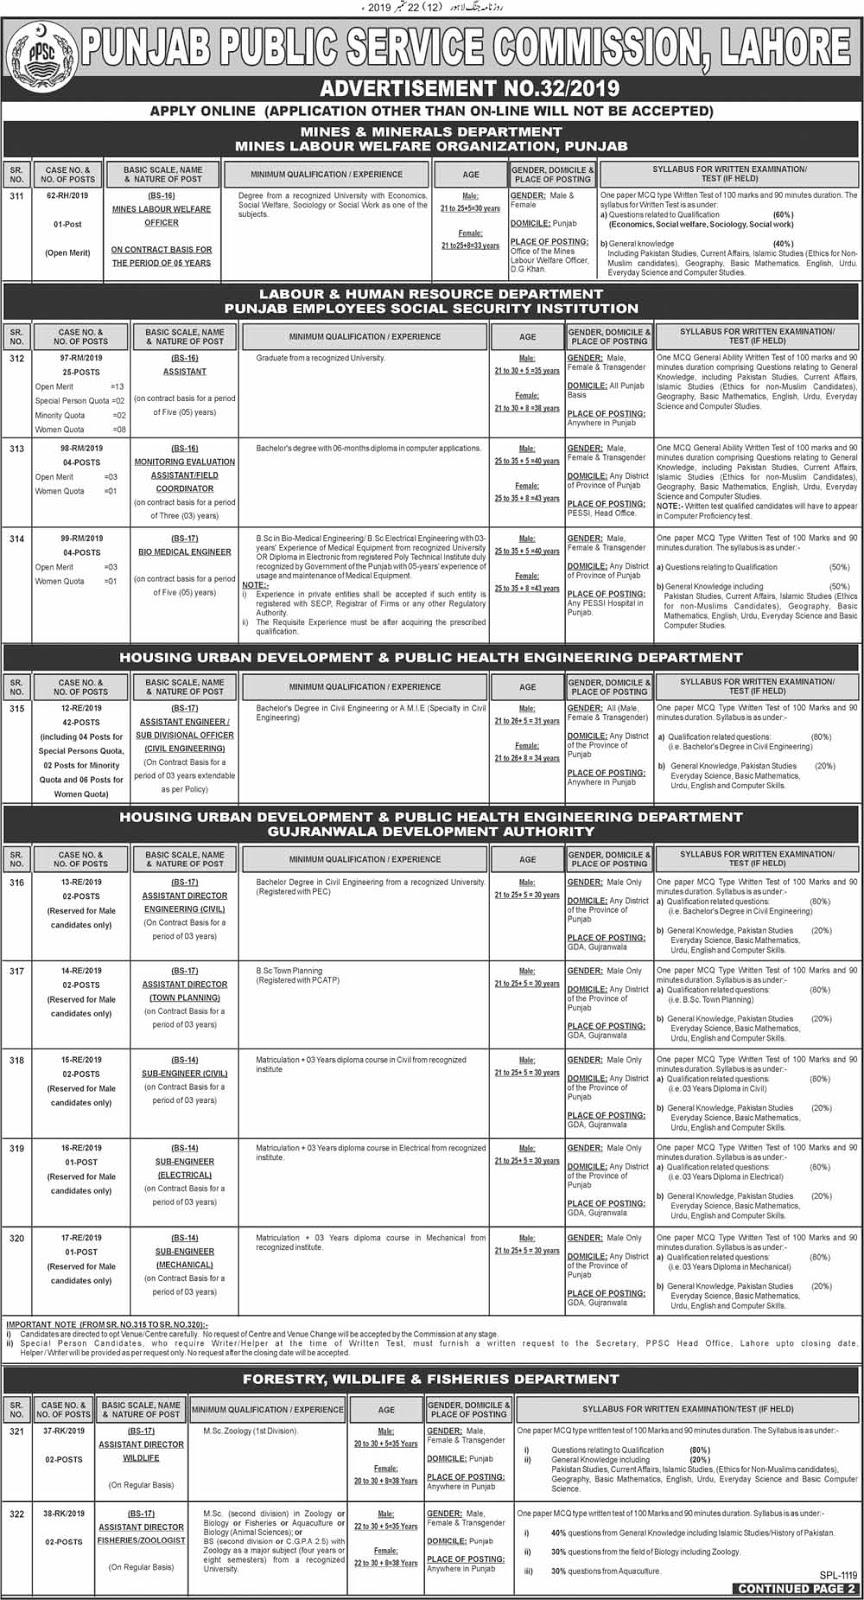 PPSC Jobs Advertisement No 32/2019